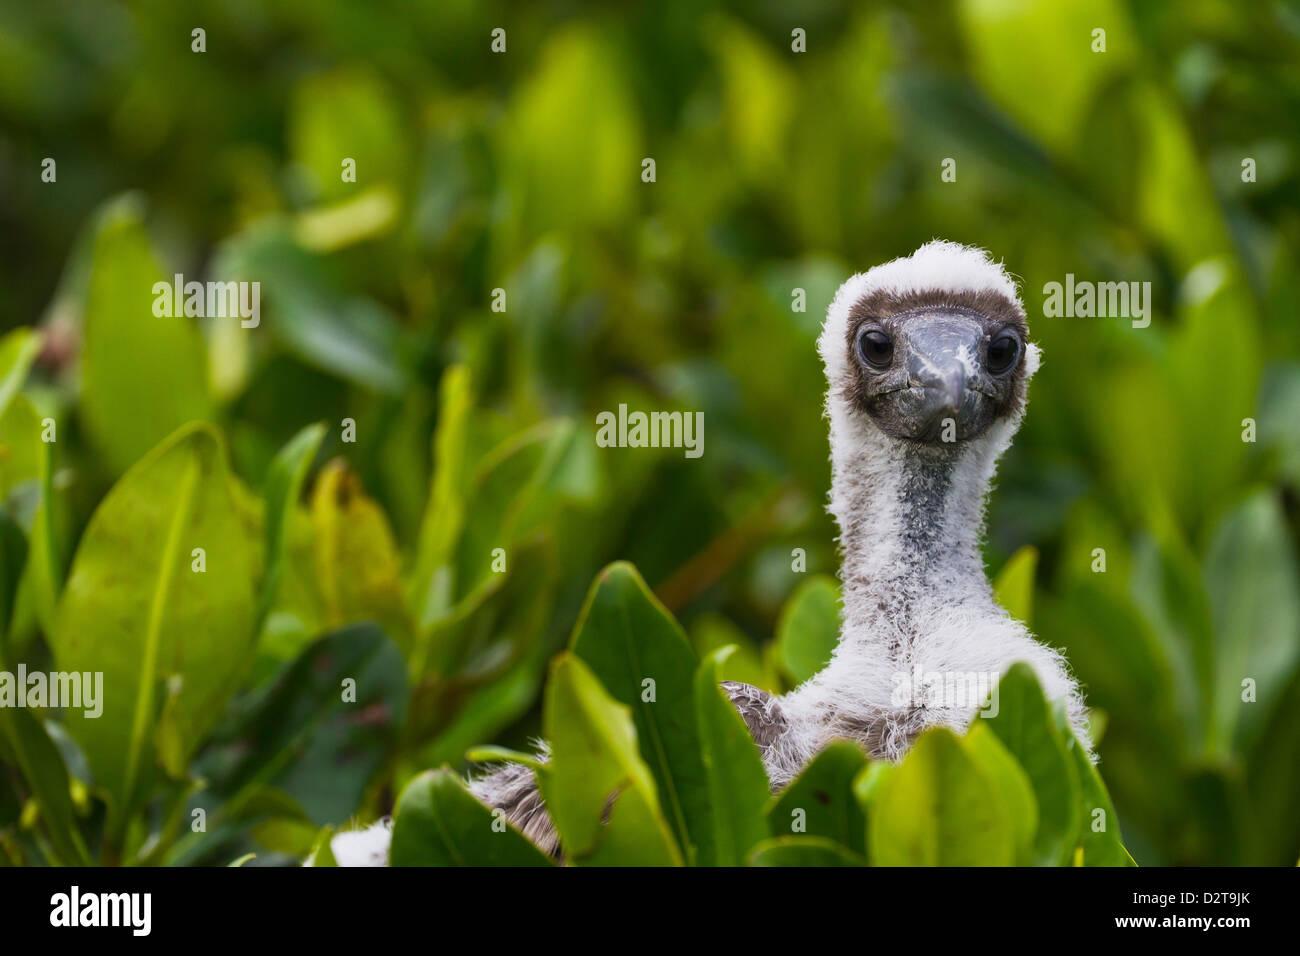 Red-footed booby (Sula sula) chick, Genovesa Island,  Galapagos Islands, Ecuador, South America - Stock Image